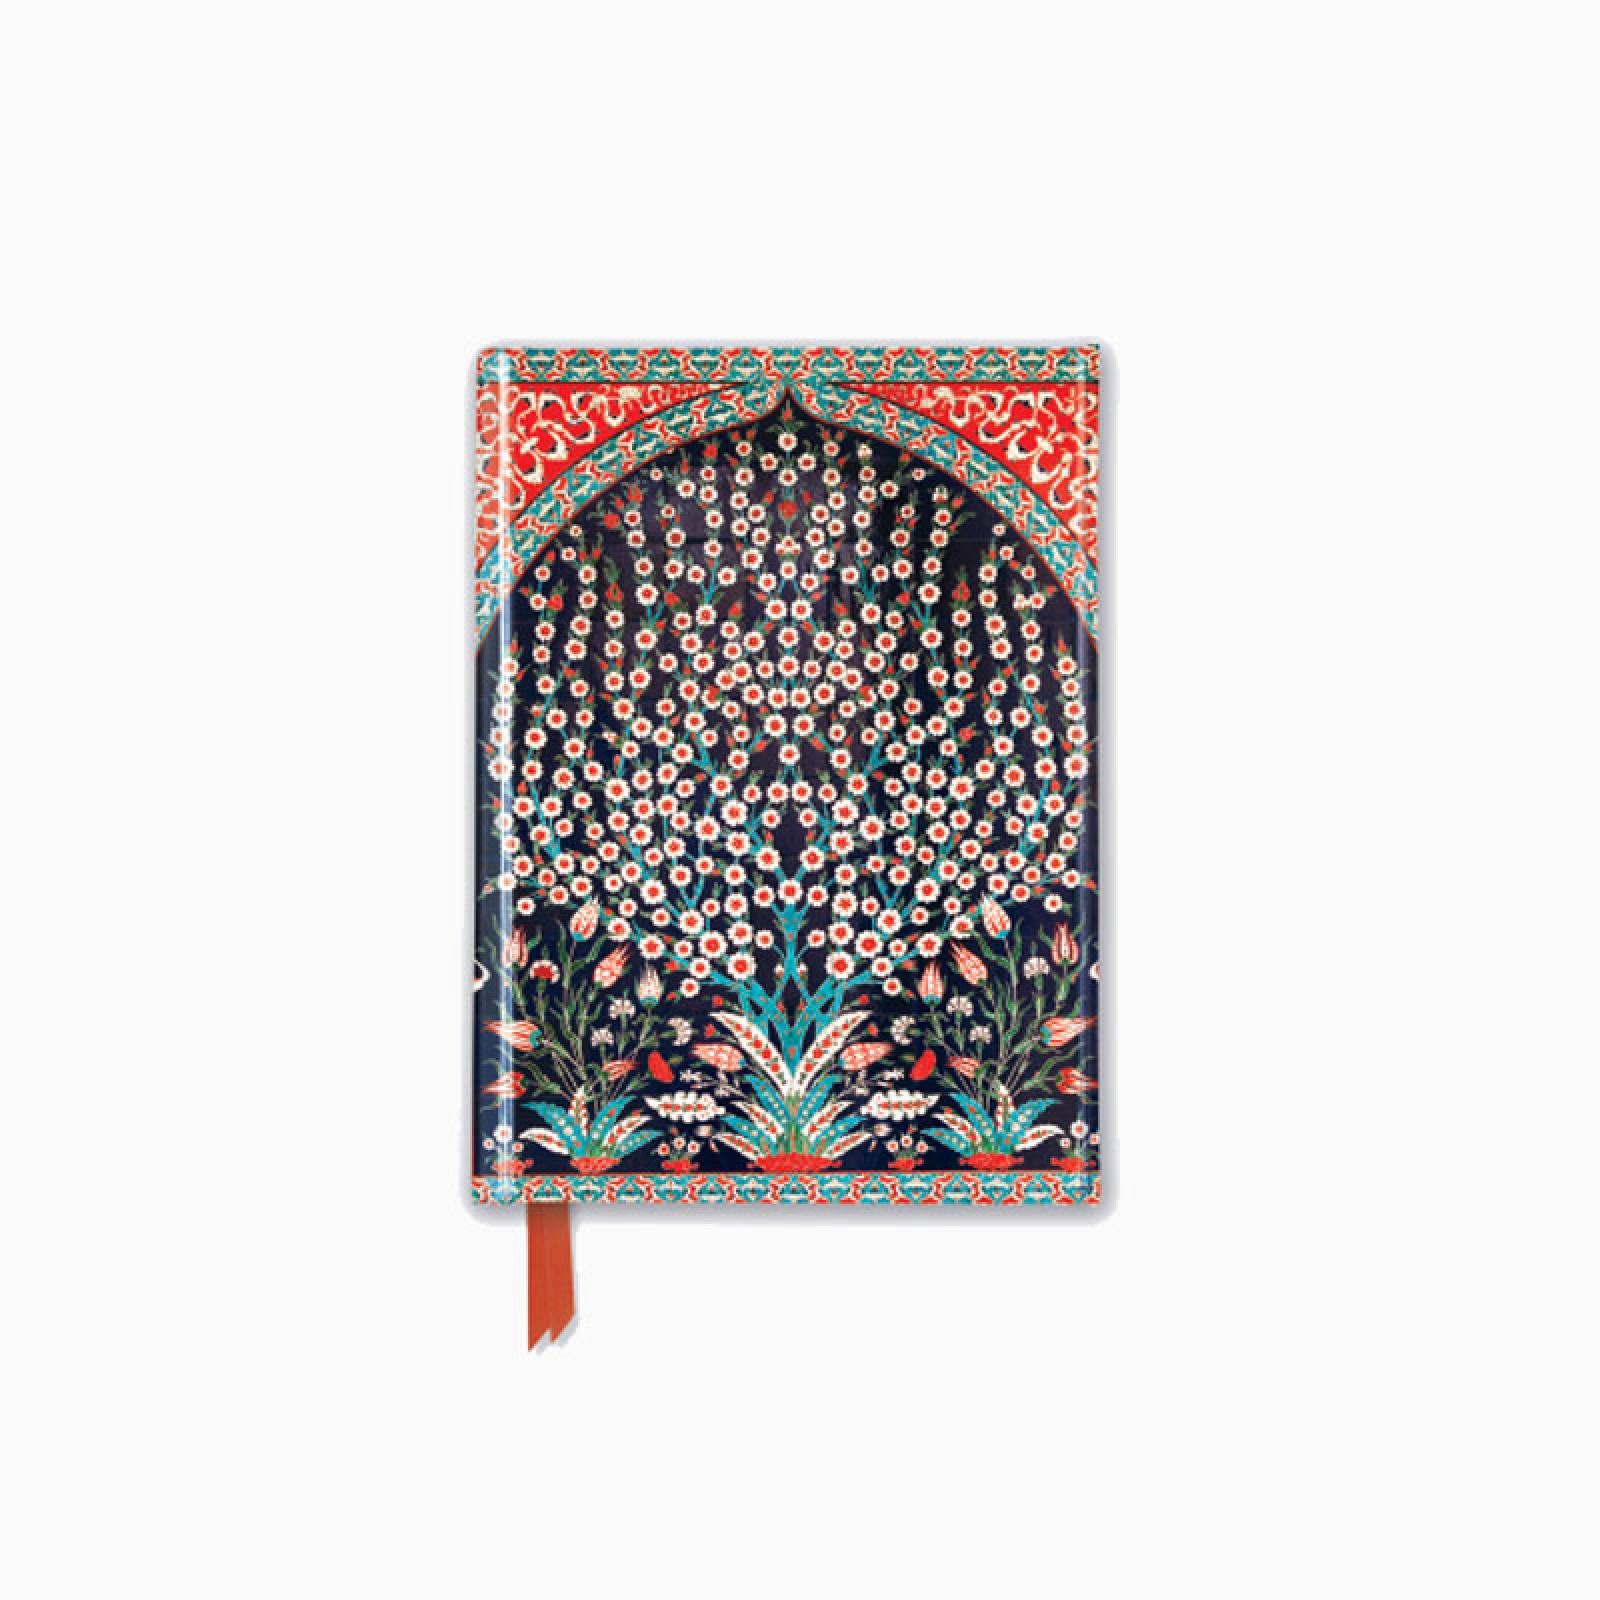 Turkish Wall Tiles - Foiled Pocket Journal